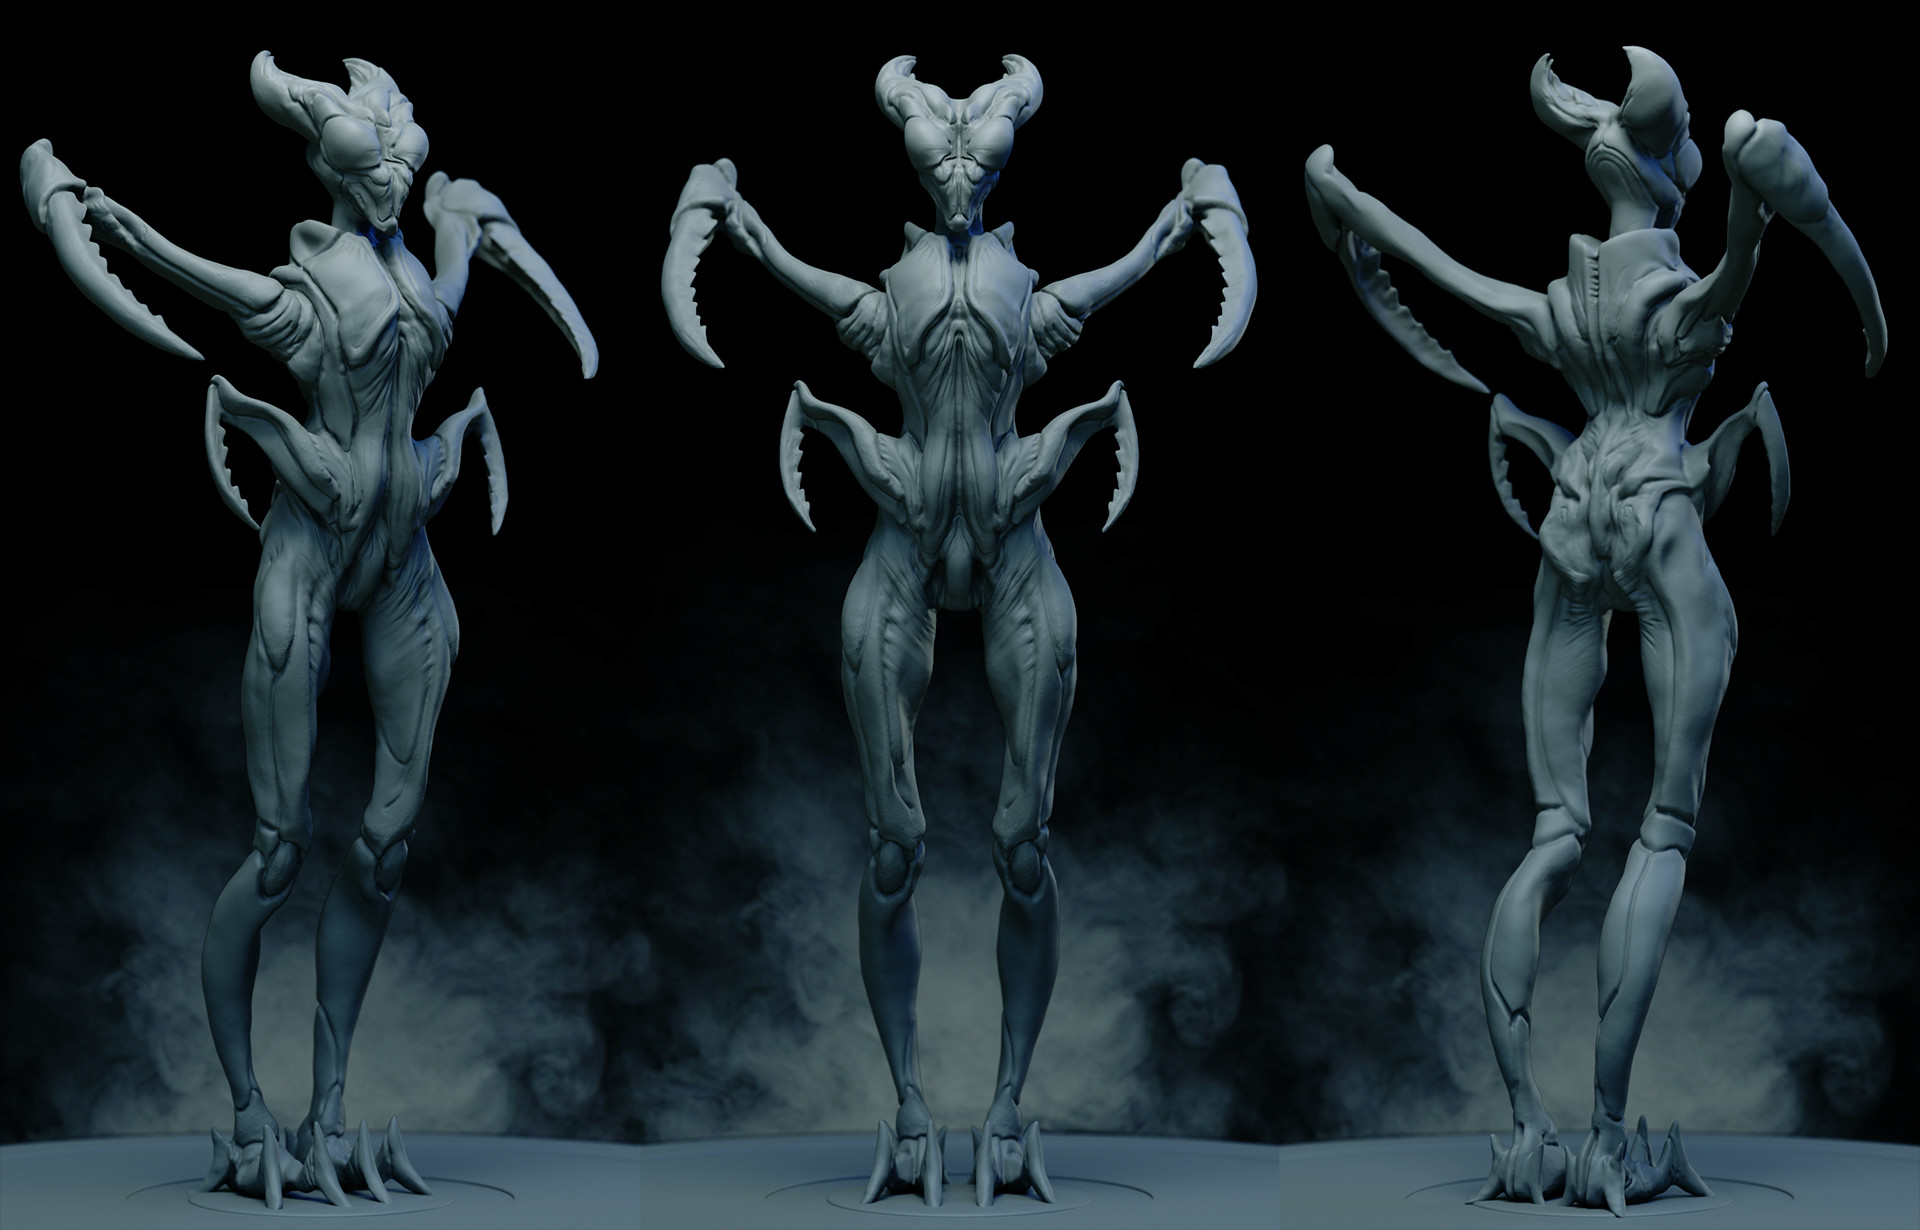 Ilhan yilmaz insectoid render sheet v07